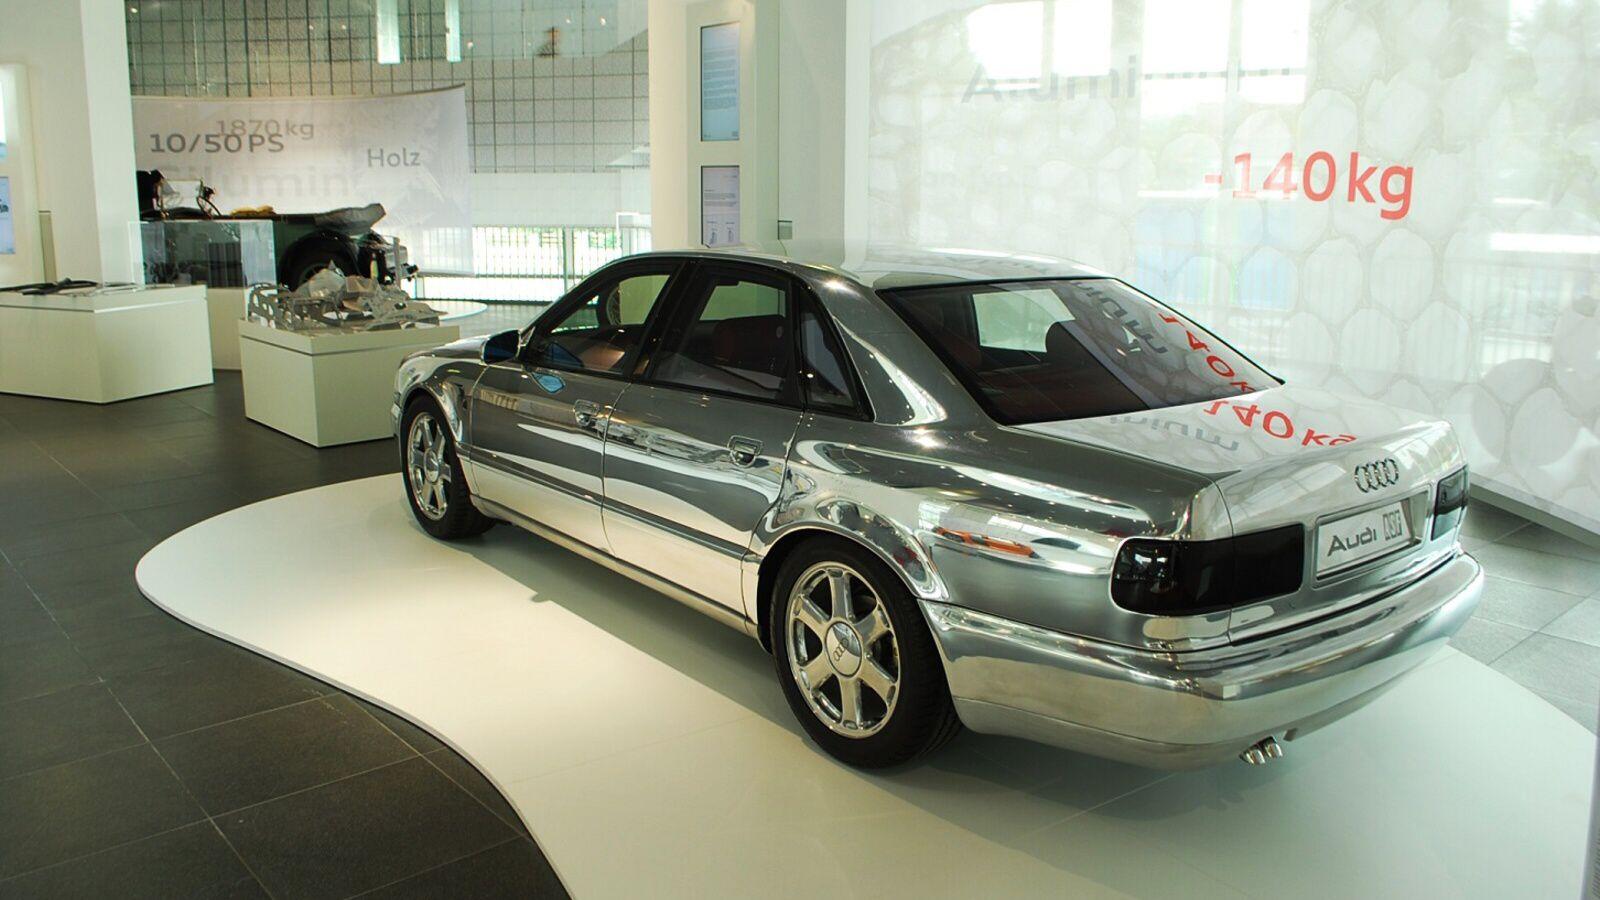 Koncept Audi A8 - tehdy nazívaný ASF